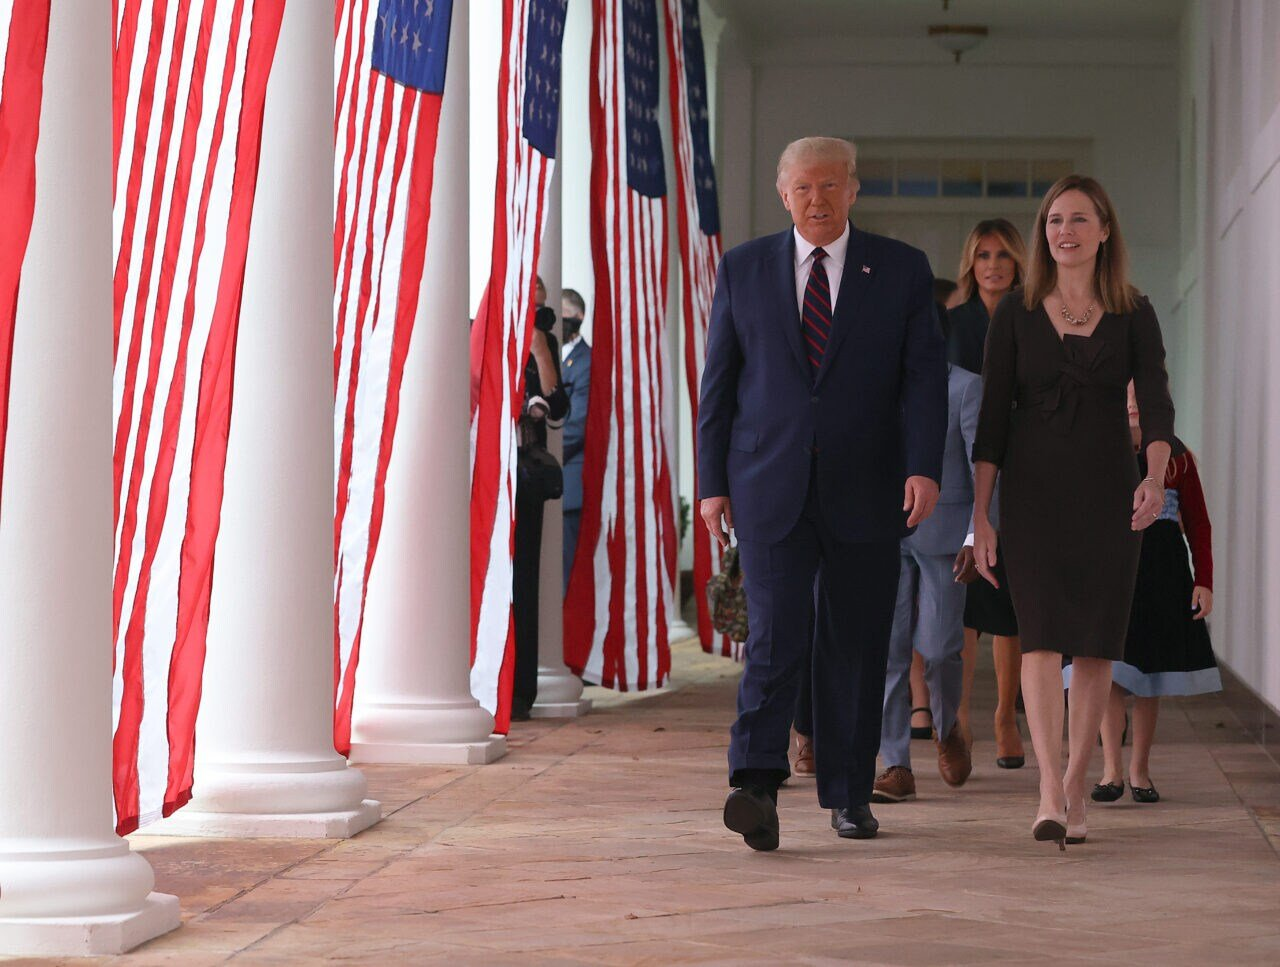 Trump selects Amy Coney Barrett for SCOTUS seat